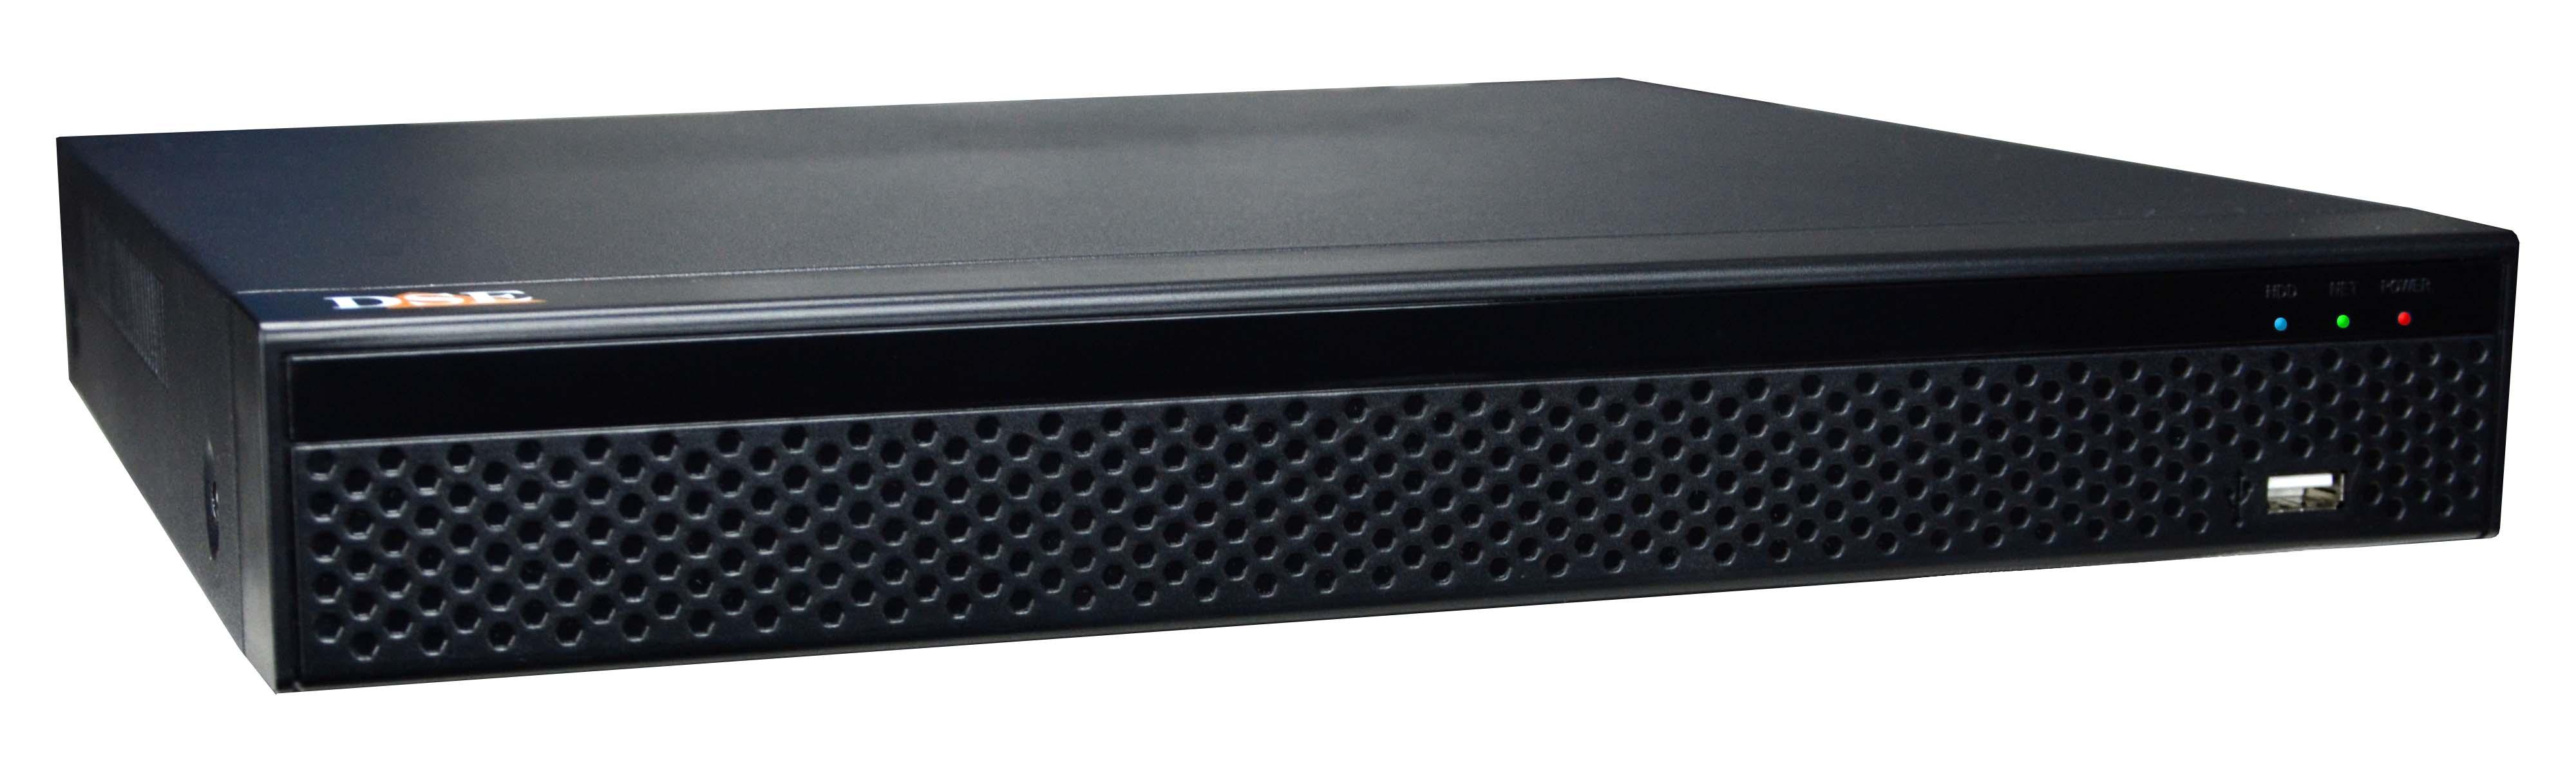 NVR 4K H265 video recorders for ONVIF IP cameras | DSE CCTV